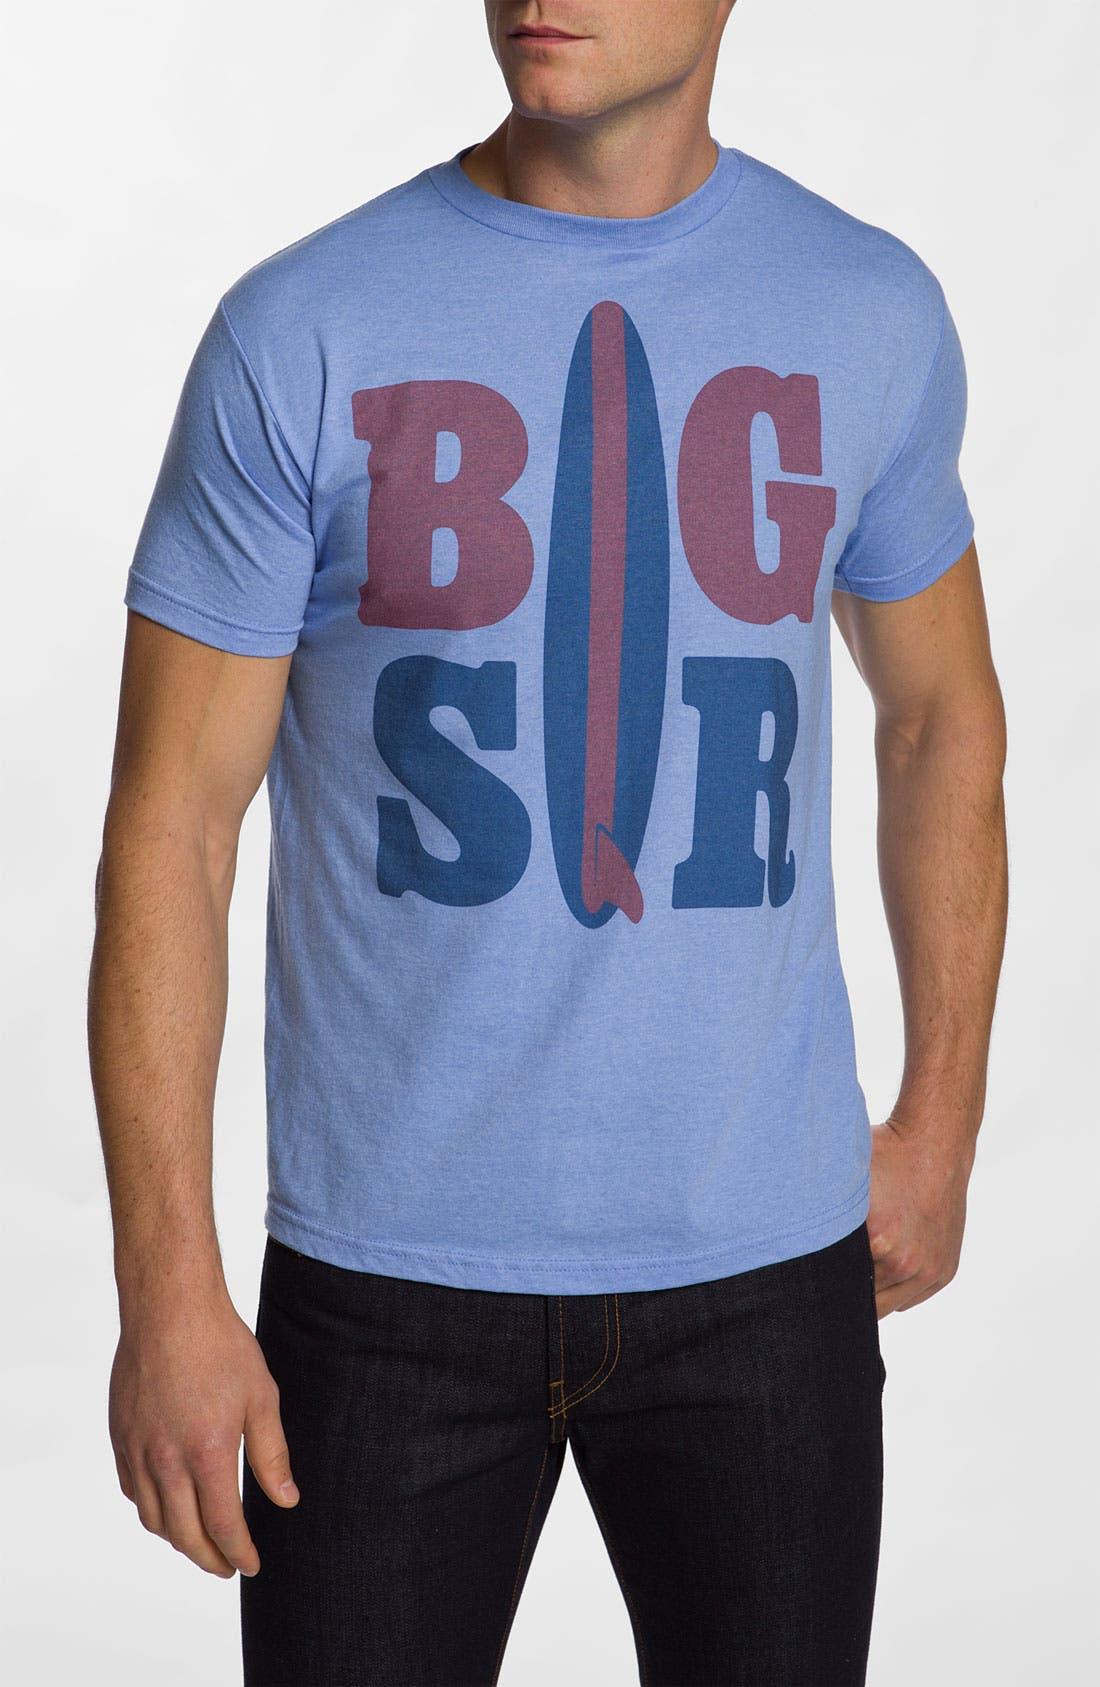 Alternate Image 1 Selected - PalmerCash 'Big Sur' T-Shirt